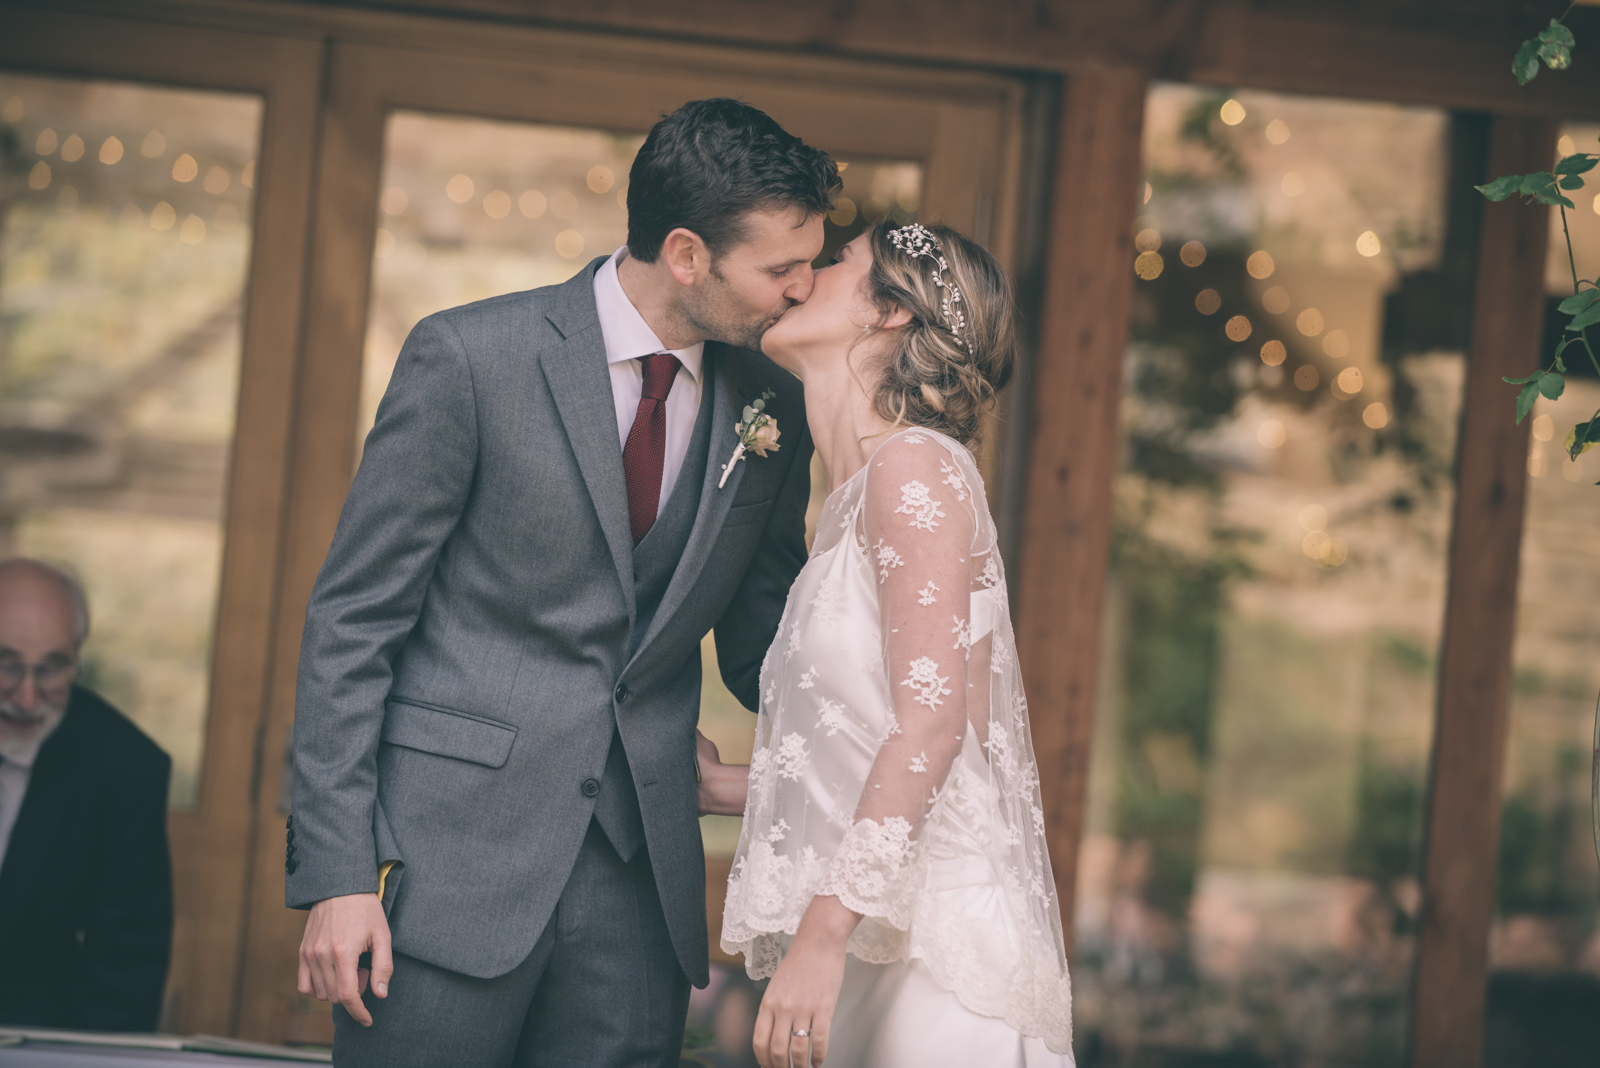 nancarrow-wedding-photography-61.jpg